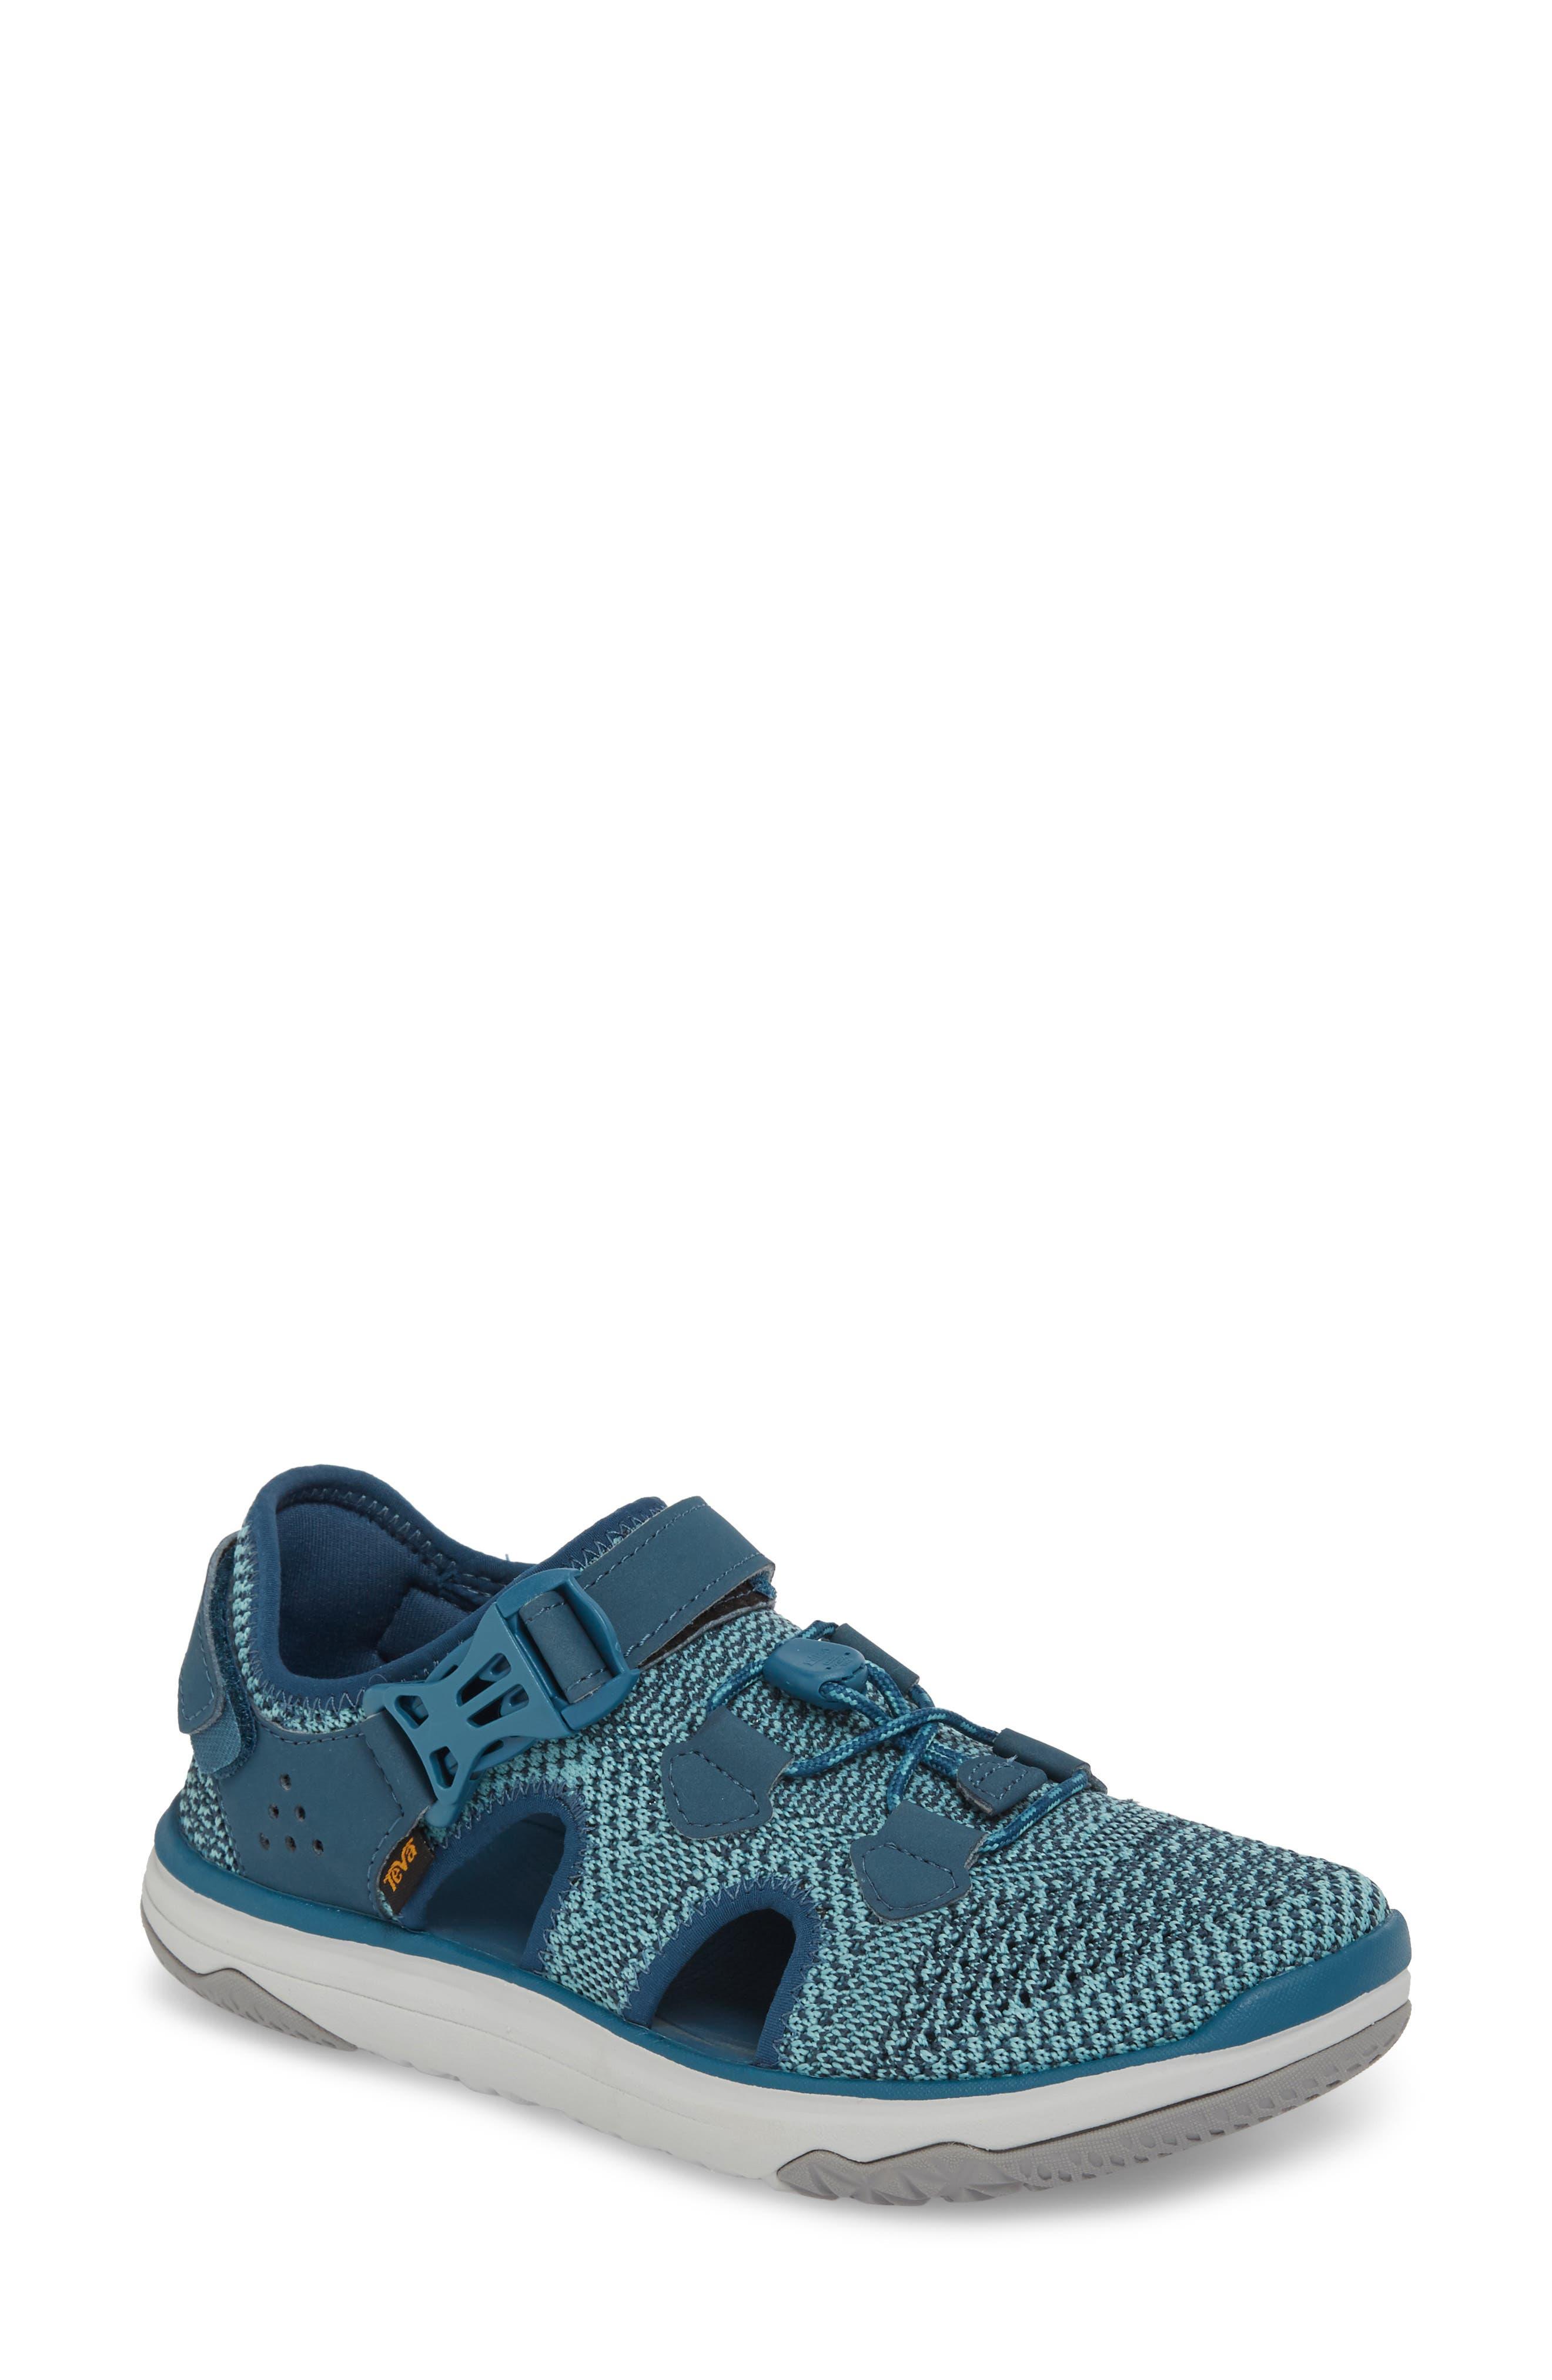 Terra Float Travel Knit Active Sandal,                             Main thumbnail 1, color,                             LEGION BLUE